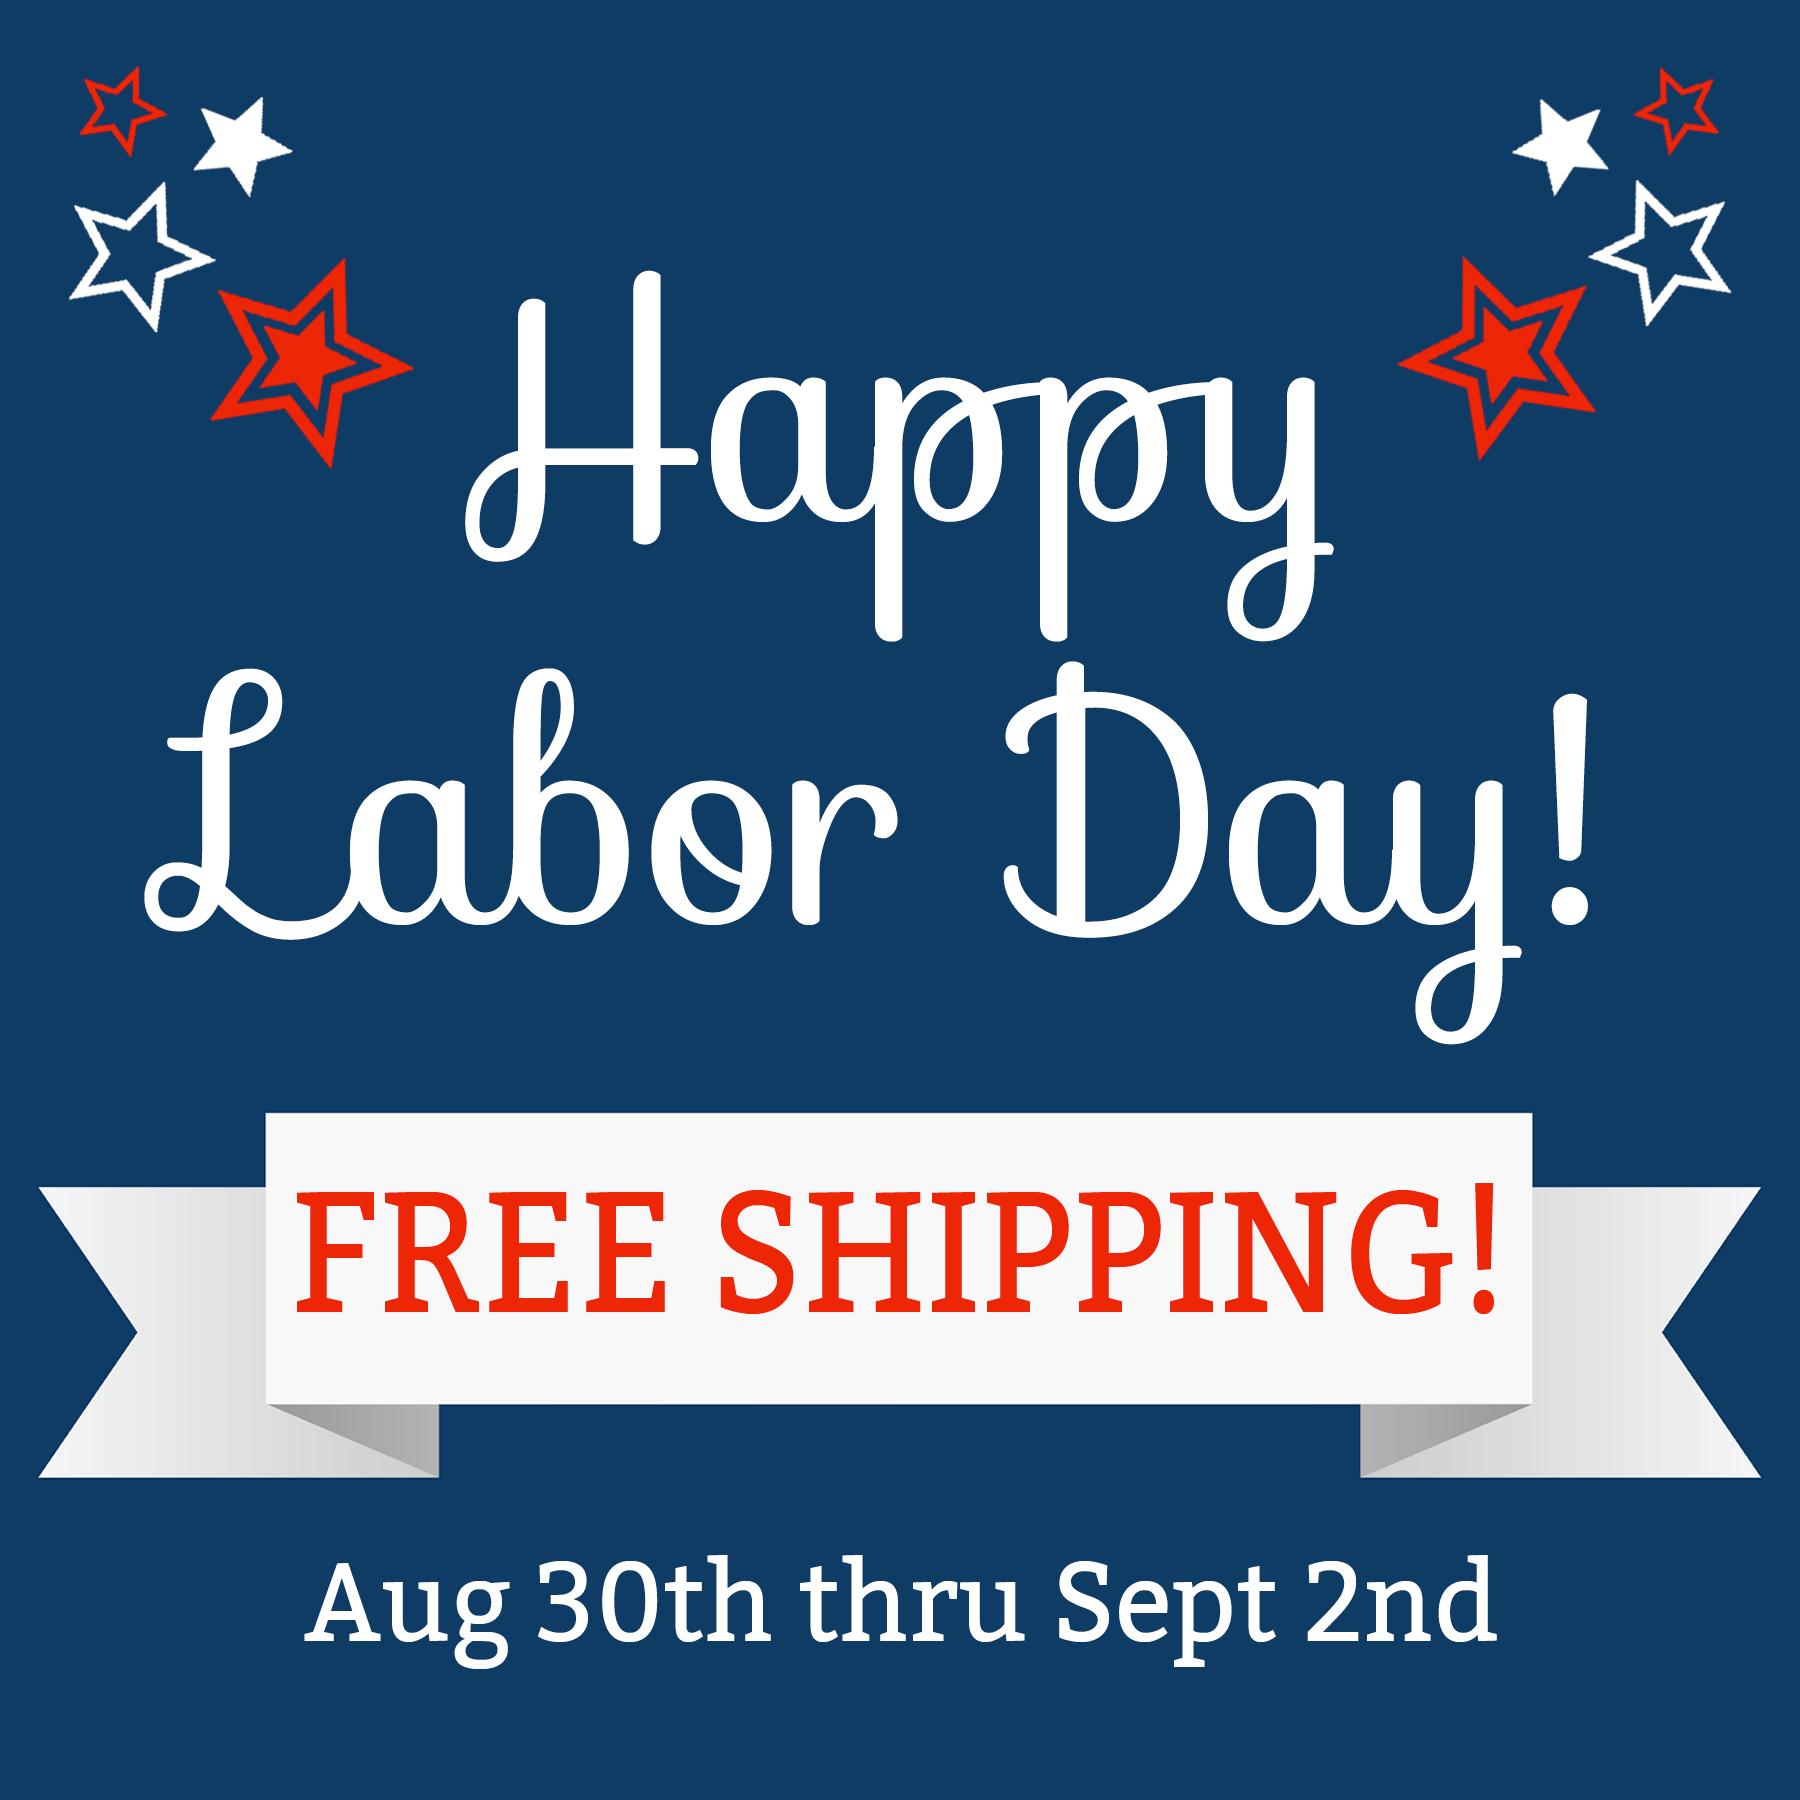 Labor-Day-Free-Shipping-Insta.jpg